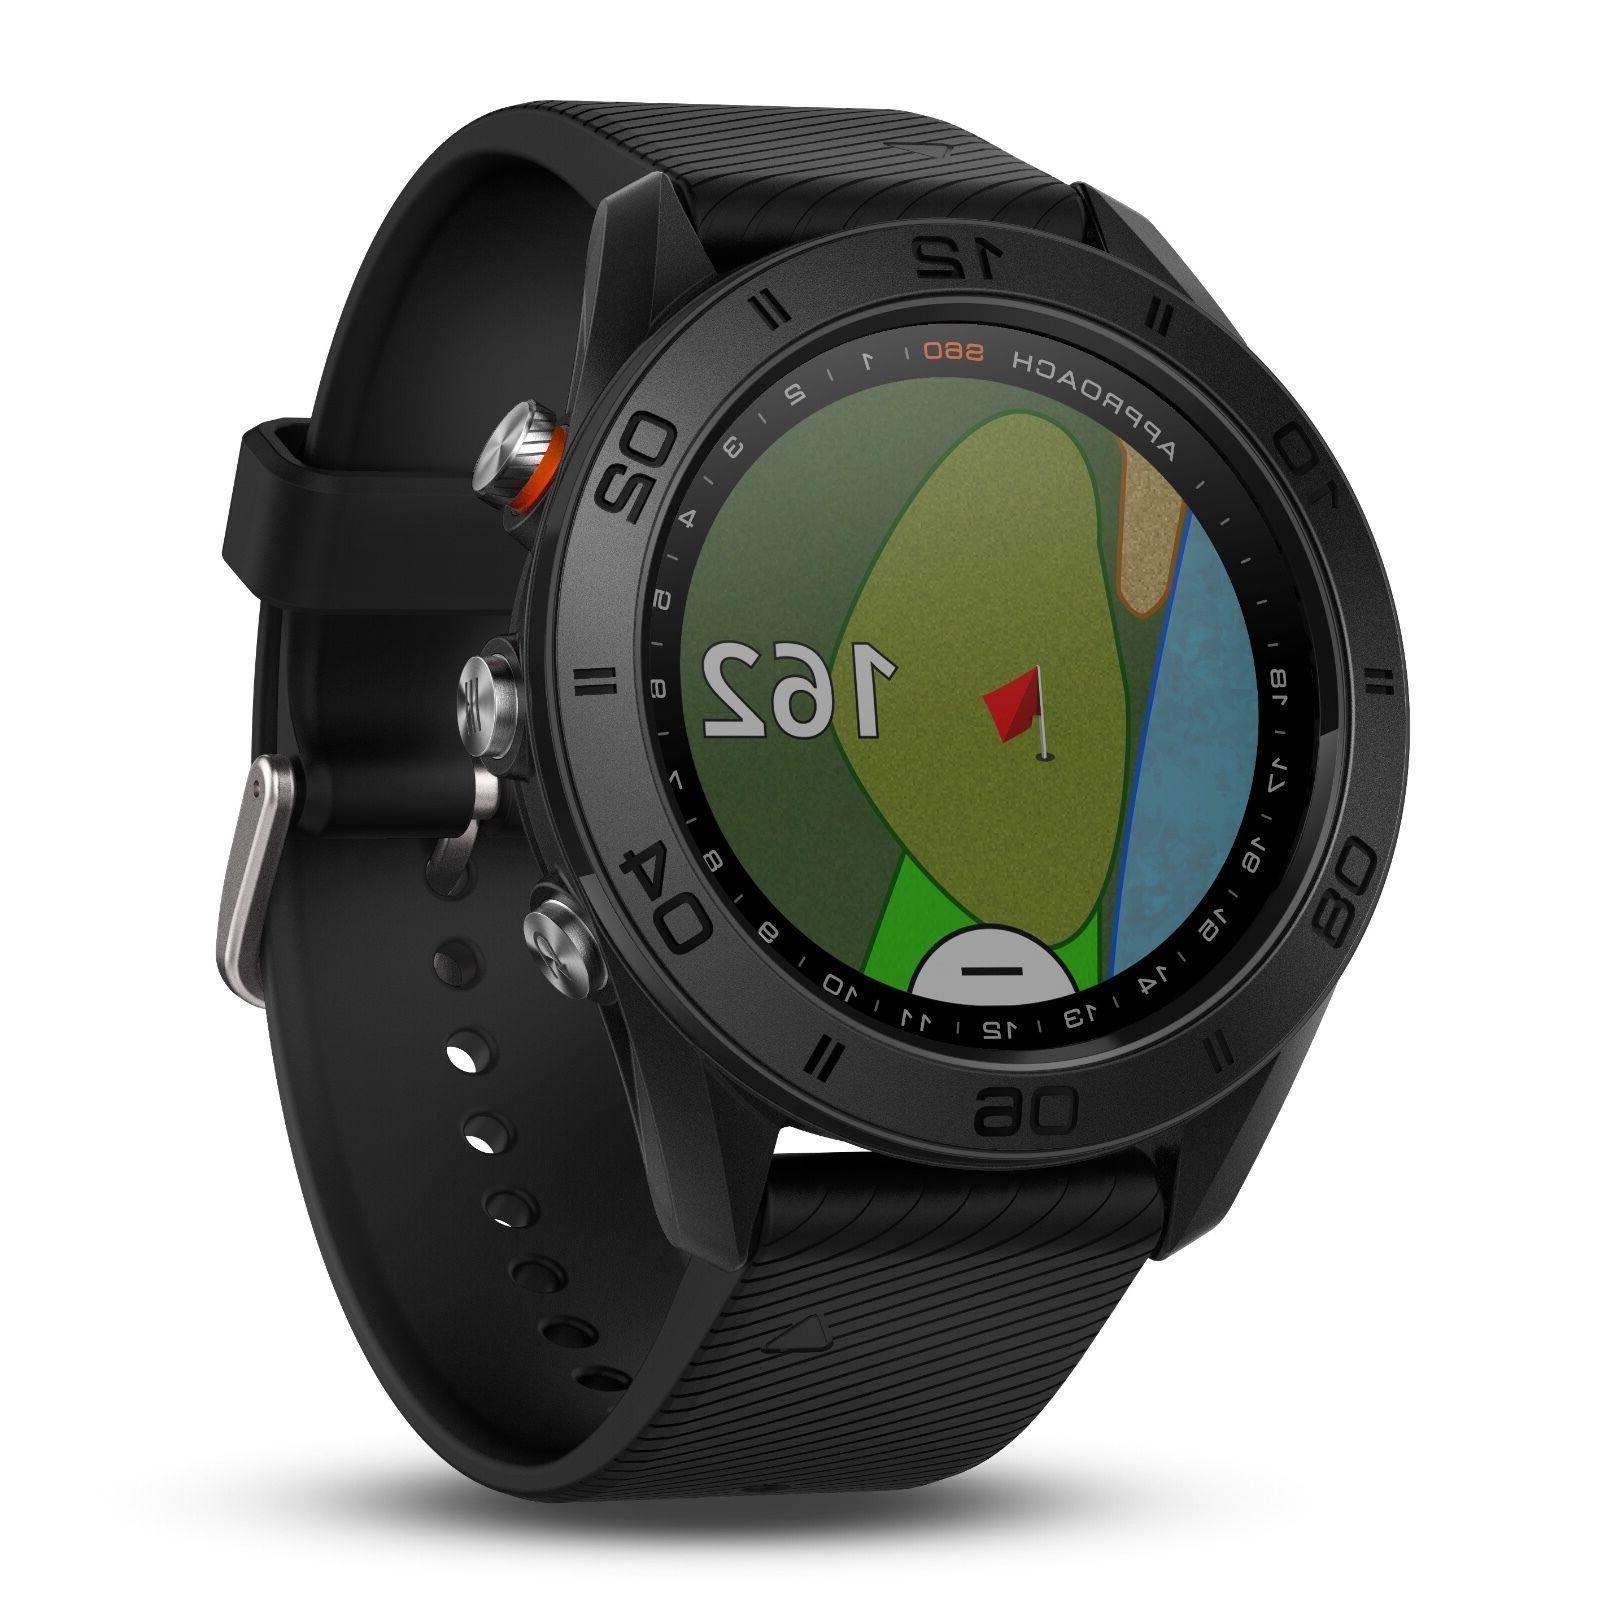 Garmin Approach S60 GPS Golf Watch Black with Black Silicone